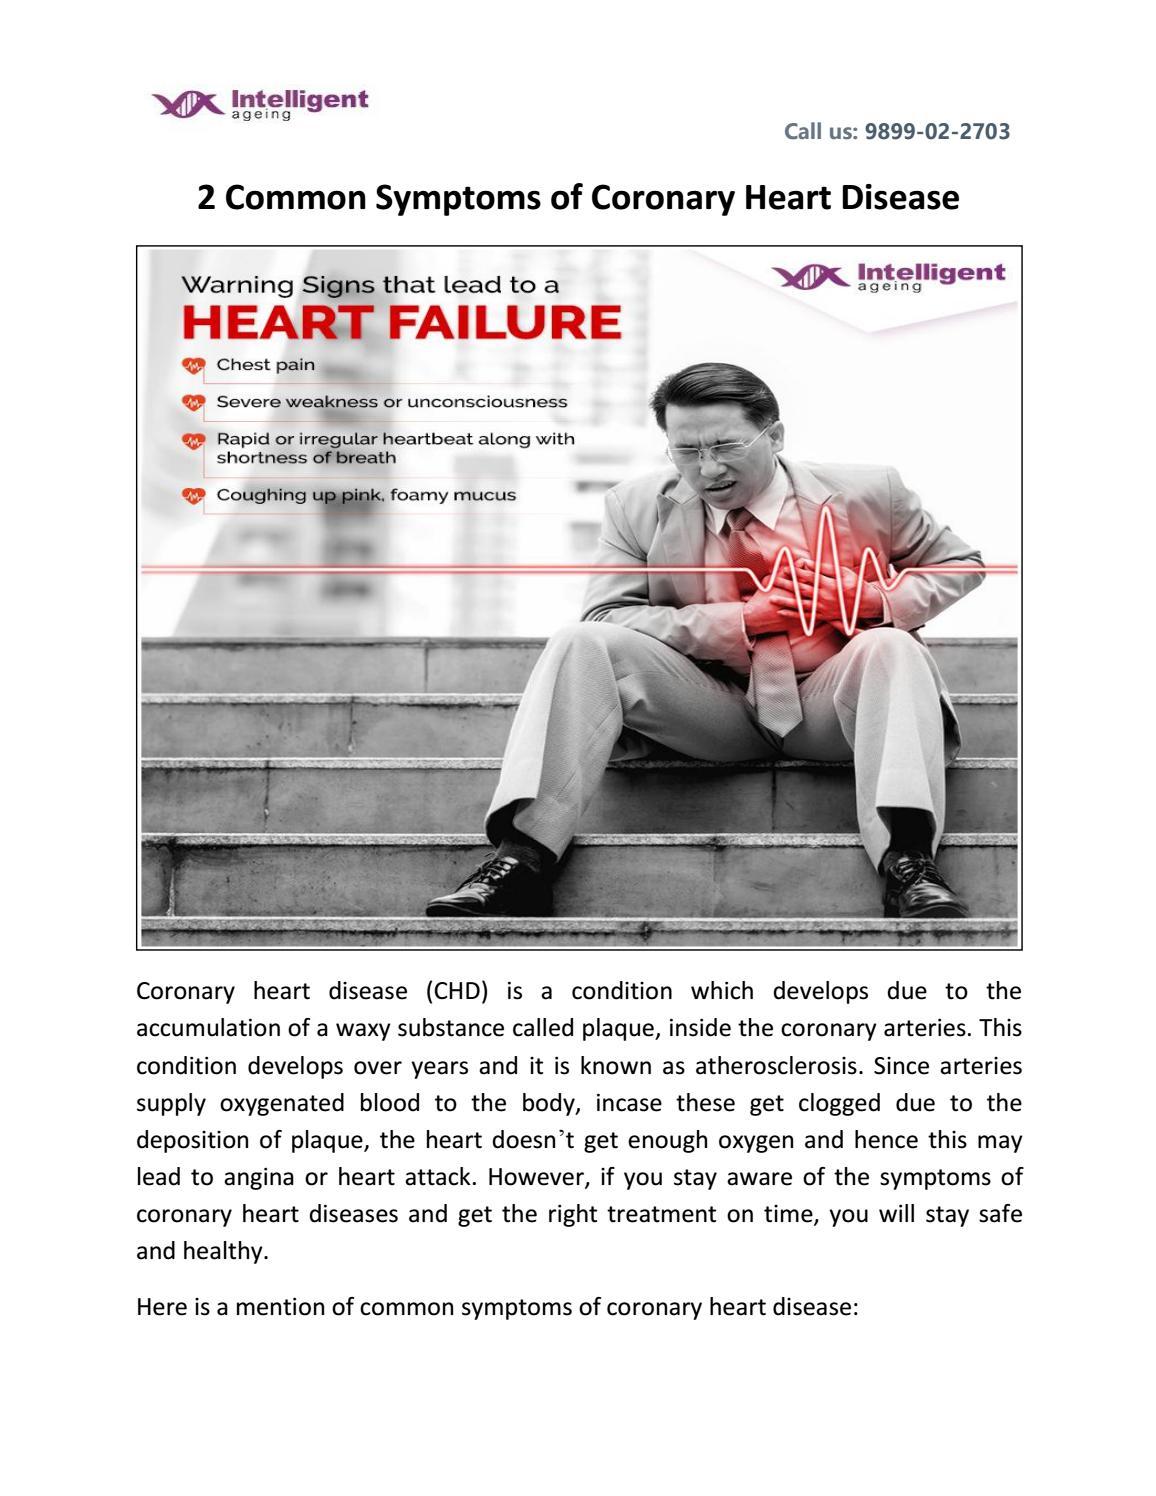 signs of coronary heart disease